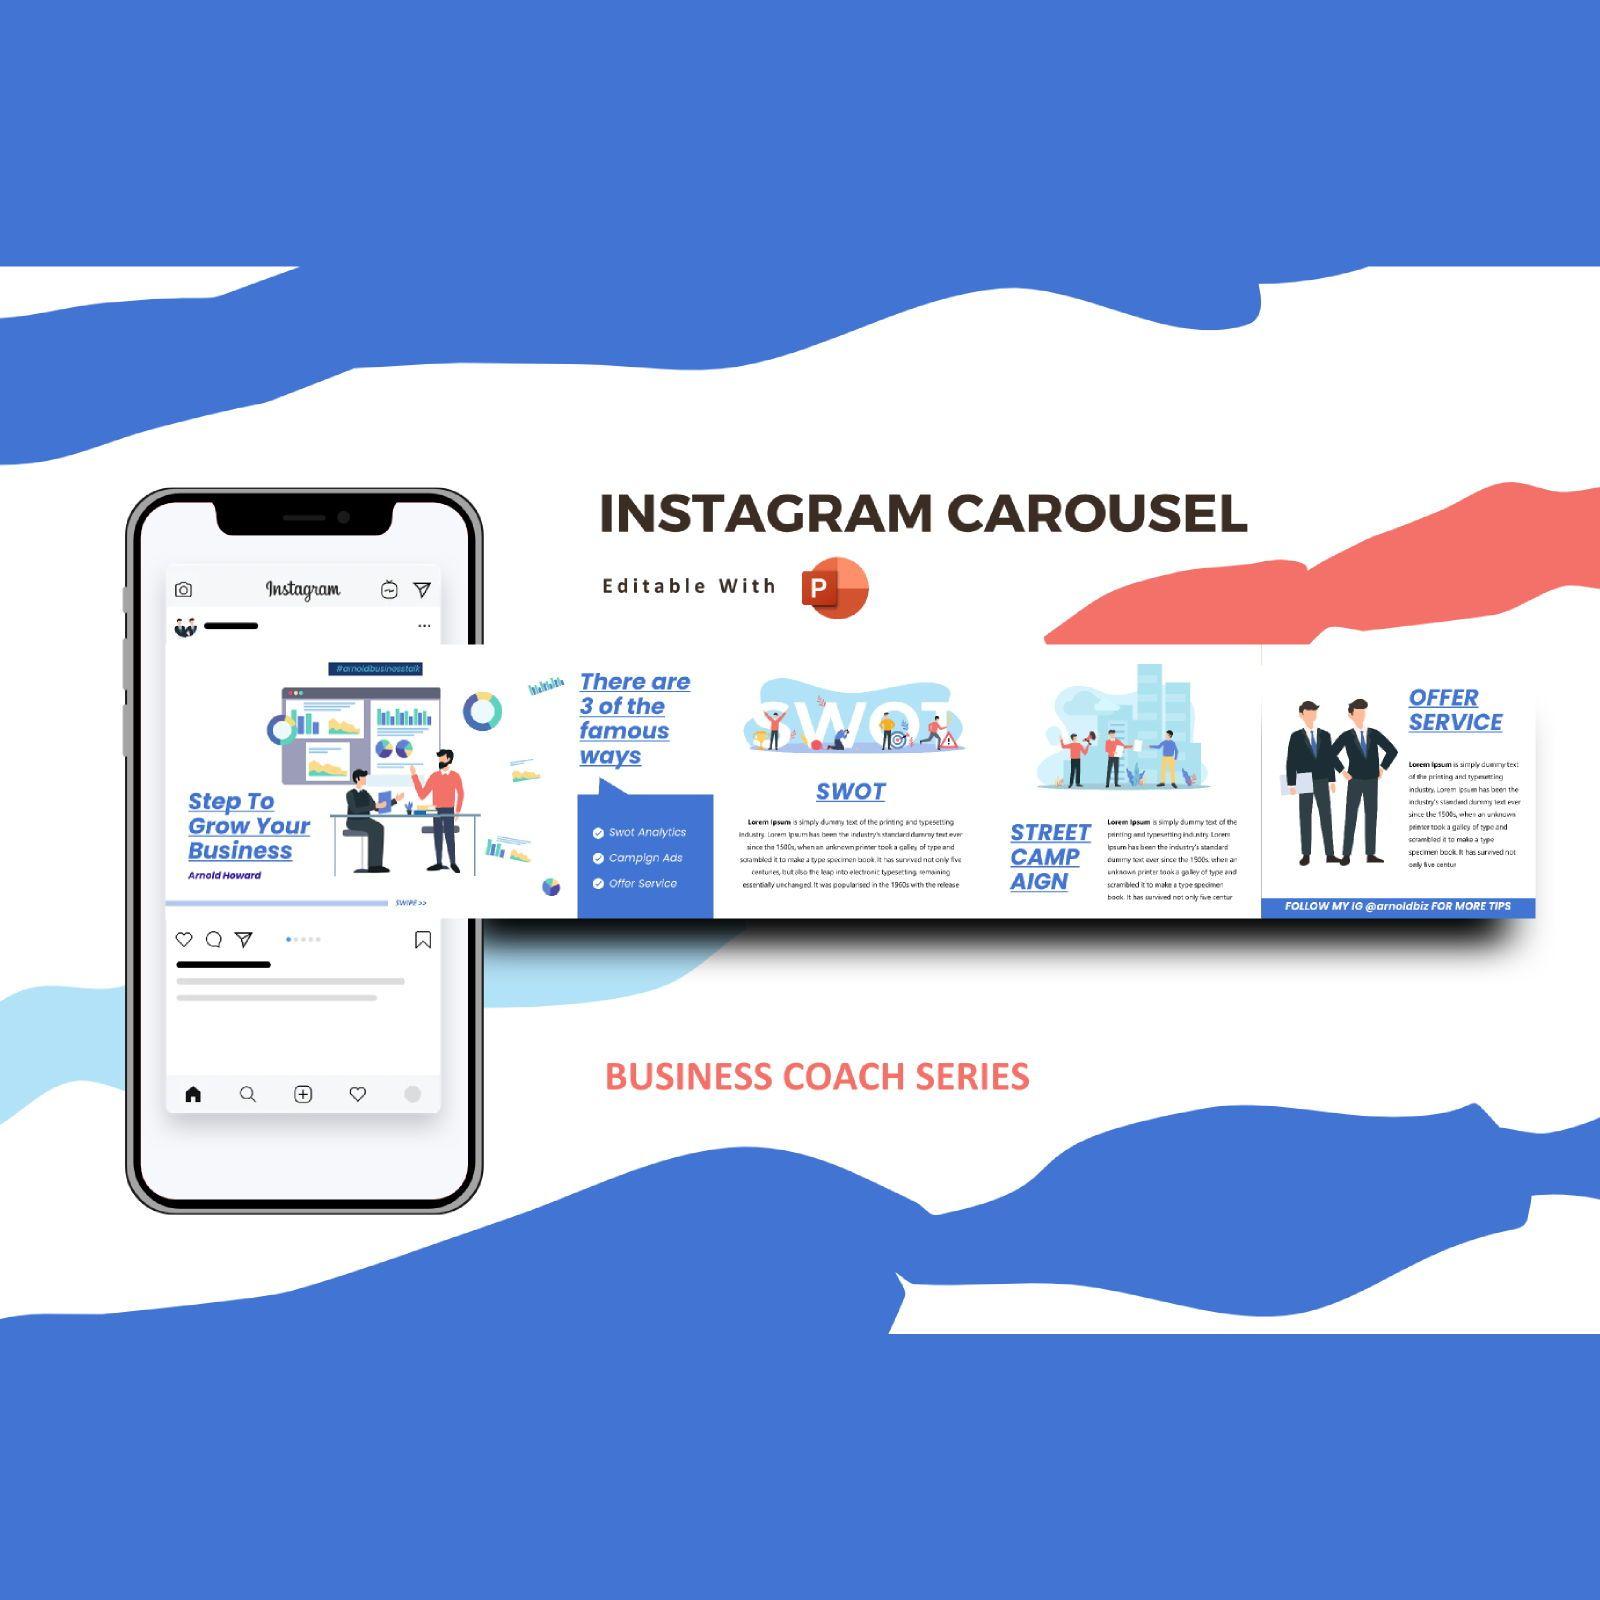 Business coaching instagram carousel powerpoint template, 07612, Business Models — PoweredTemplate.com